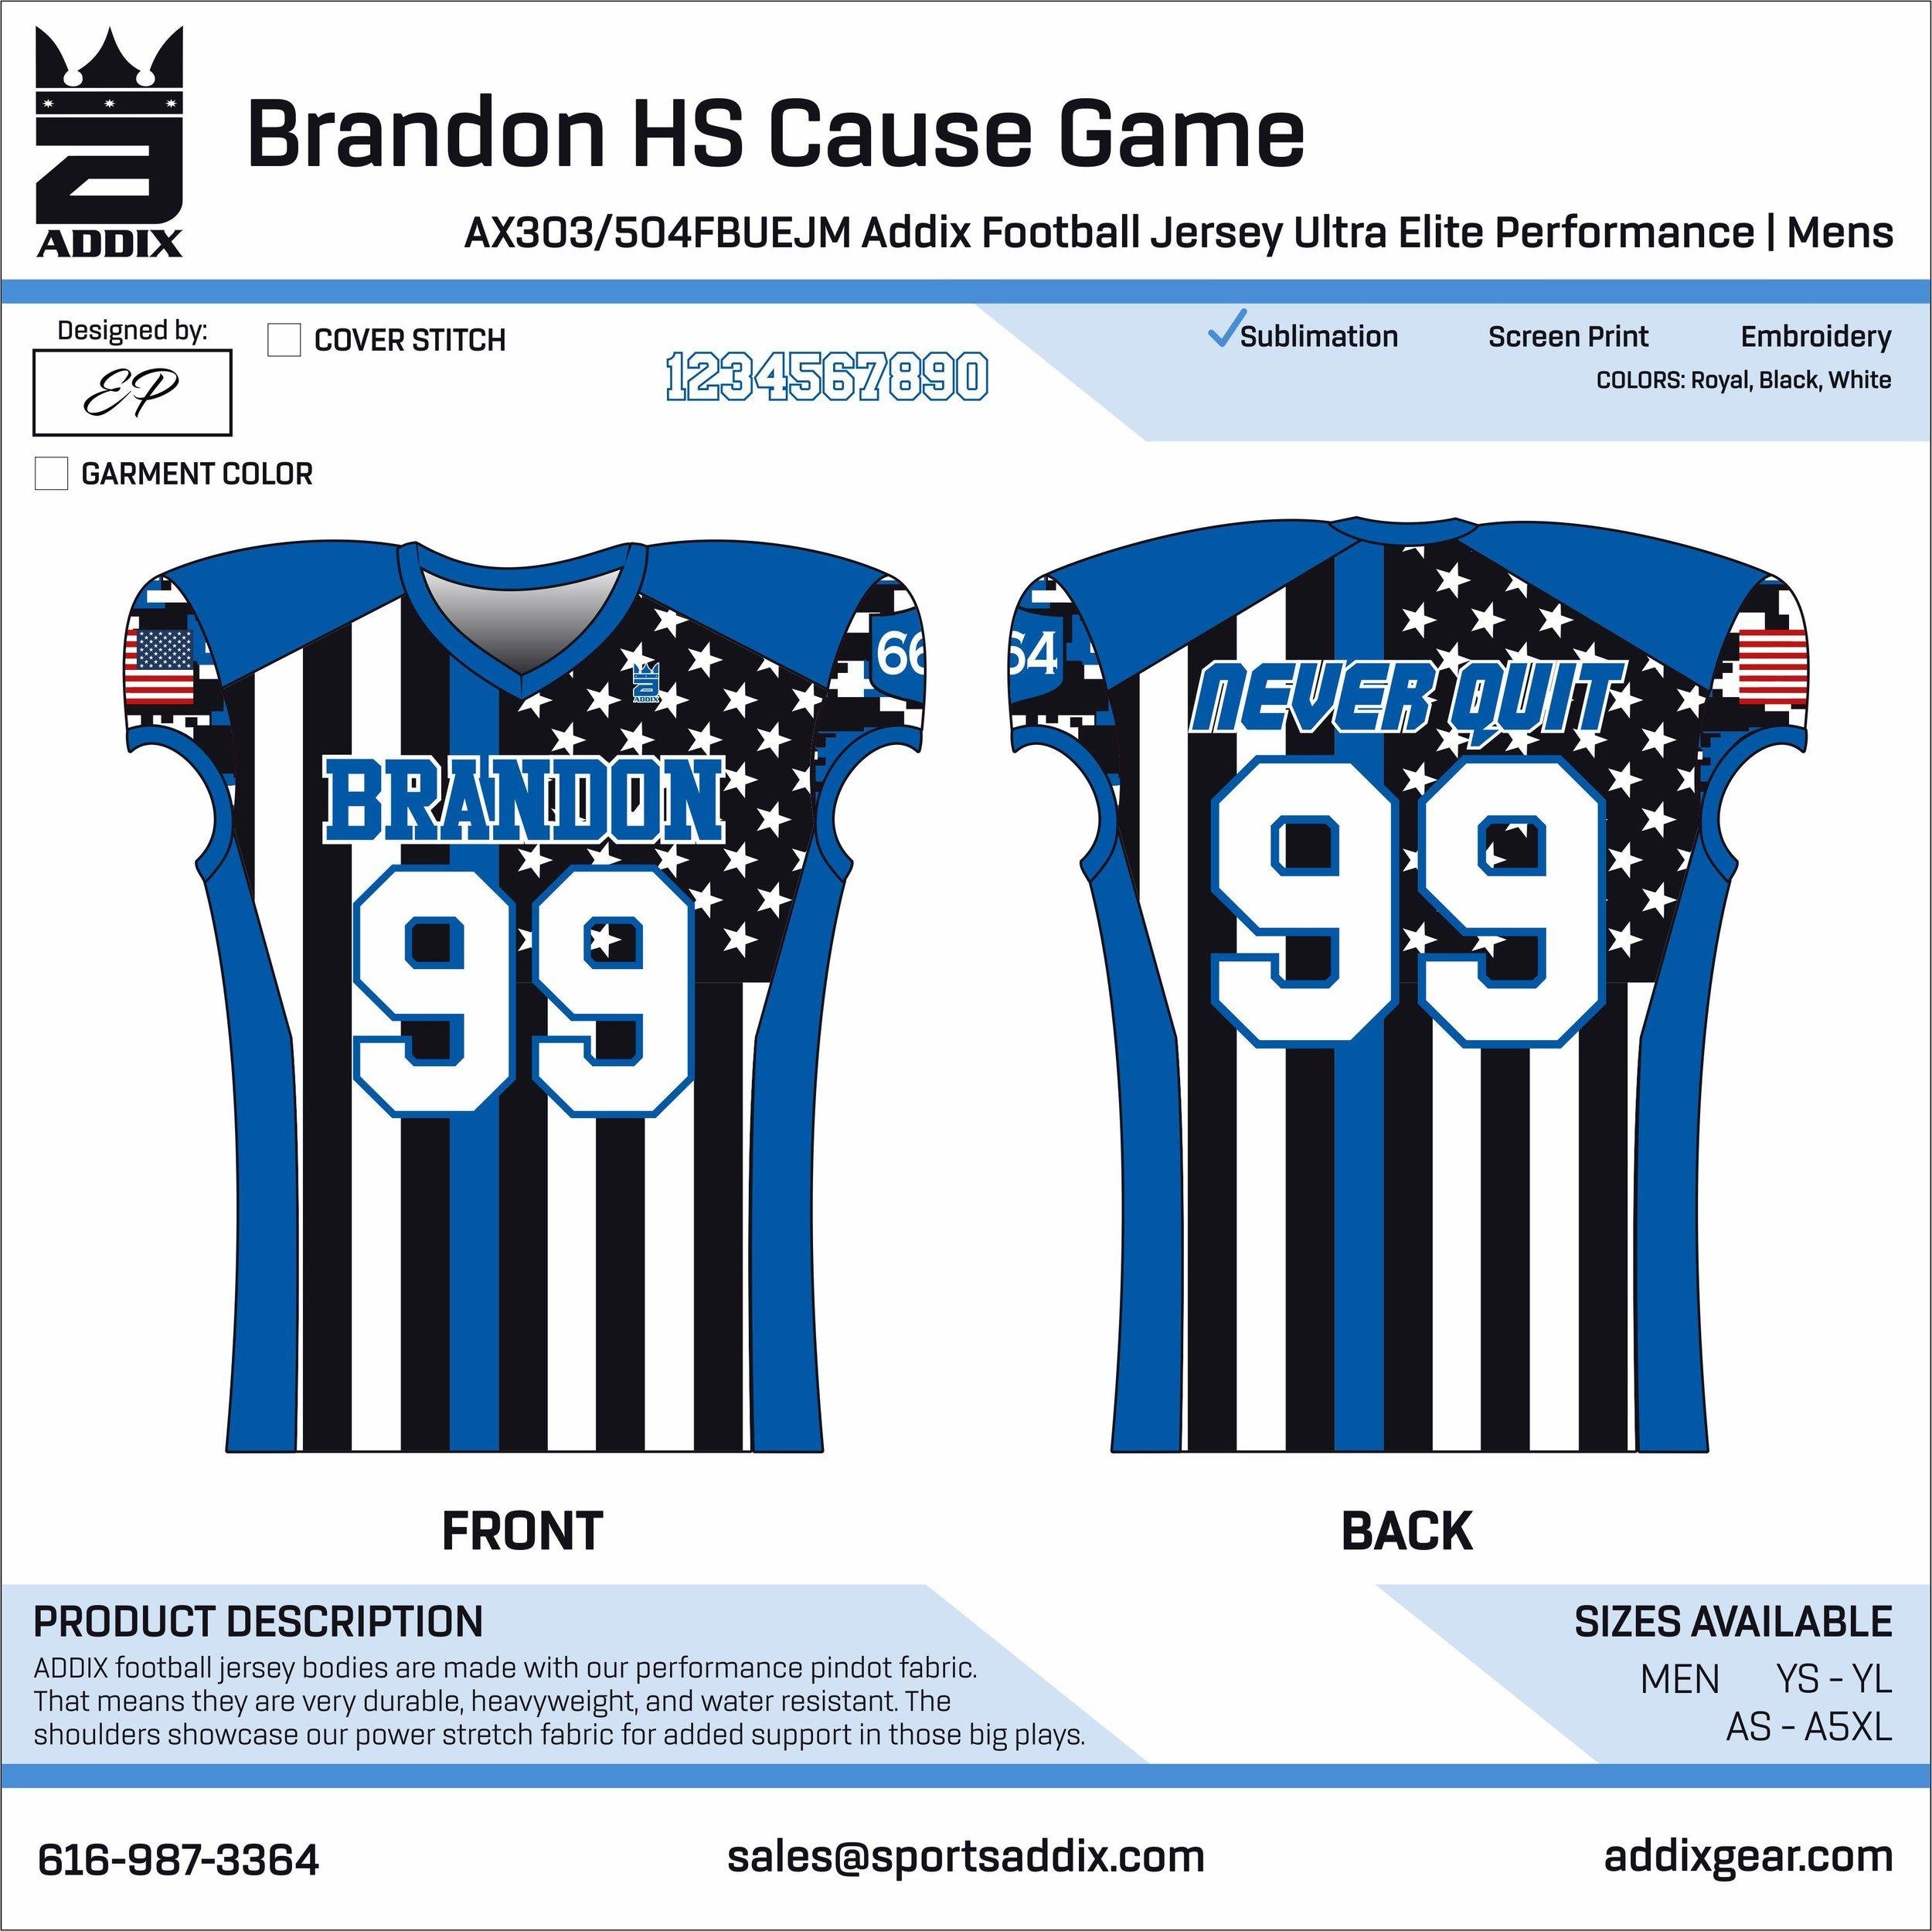 Brandon HS Cause Game_2018_6-7_EP_UE Football Jersey.jpg